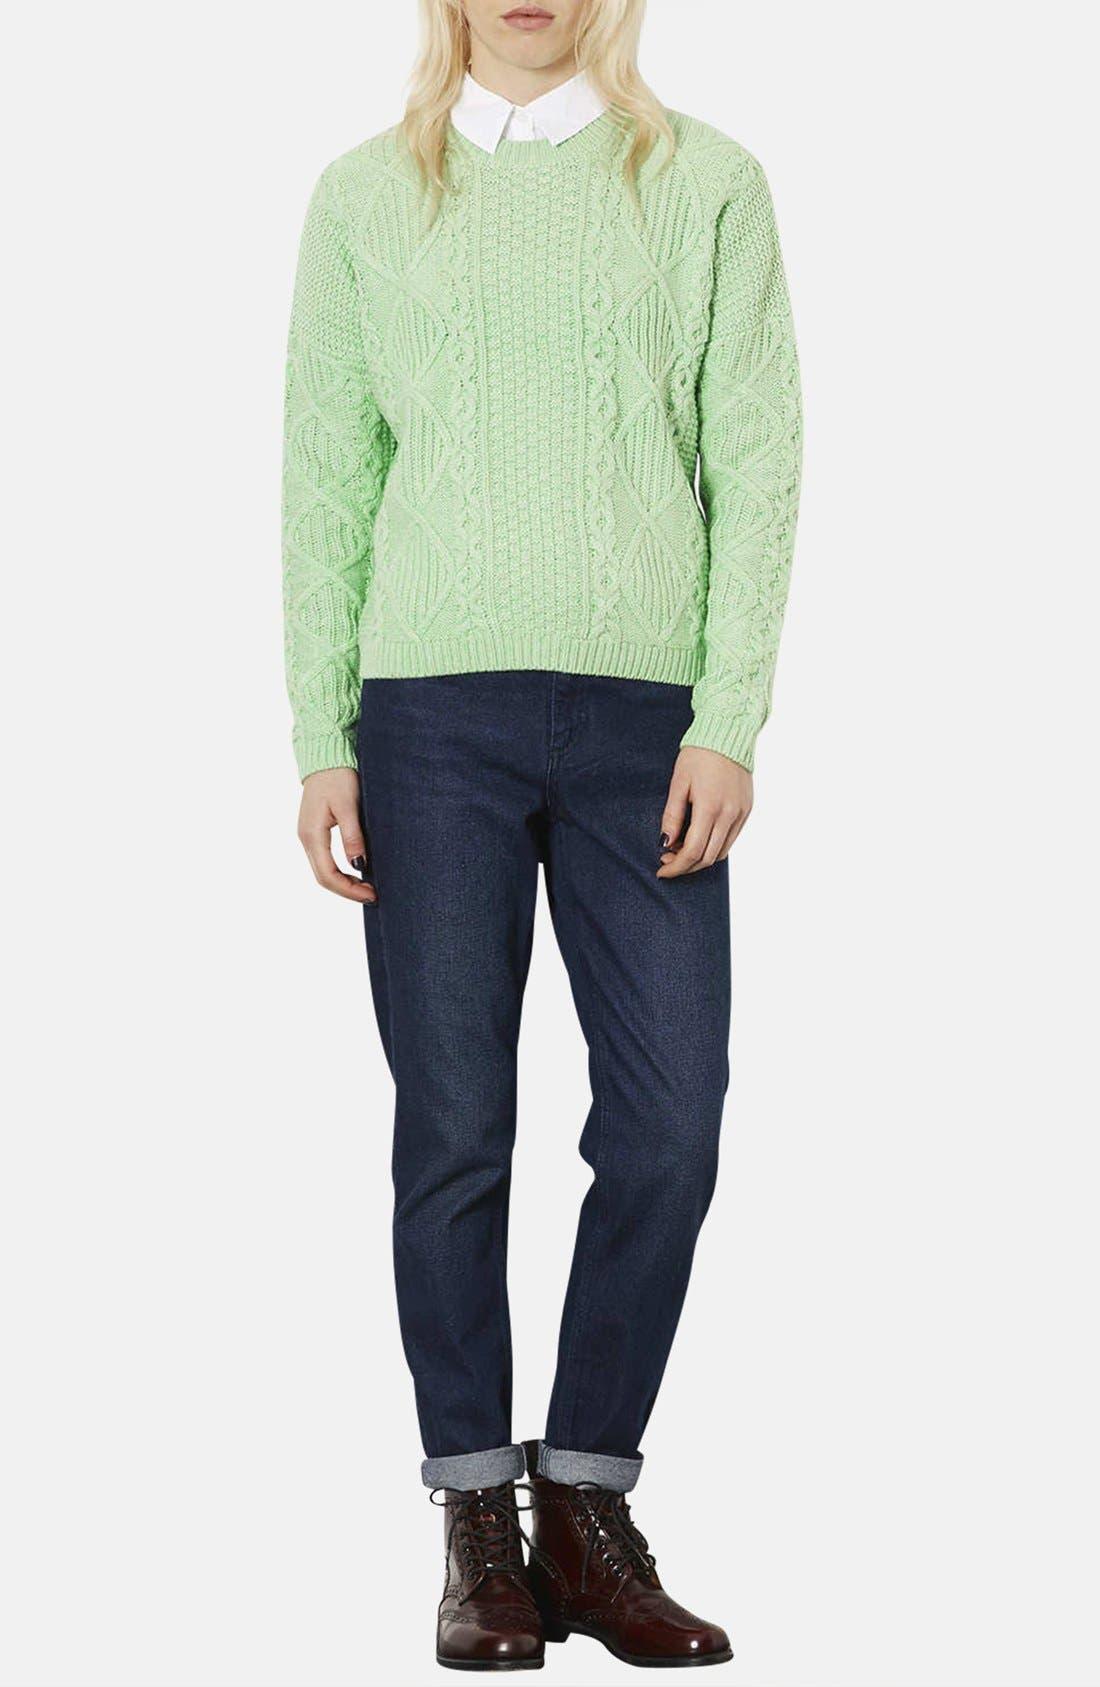 TOPSHOP, Crewneck Cable Knit Sweater, Alternate thumbnail 4, color, 340